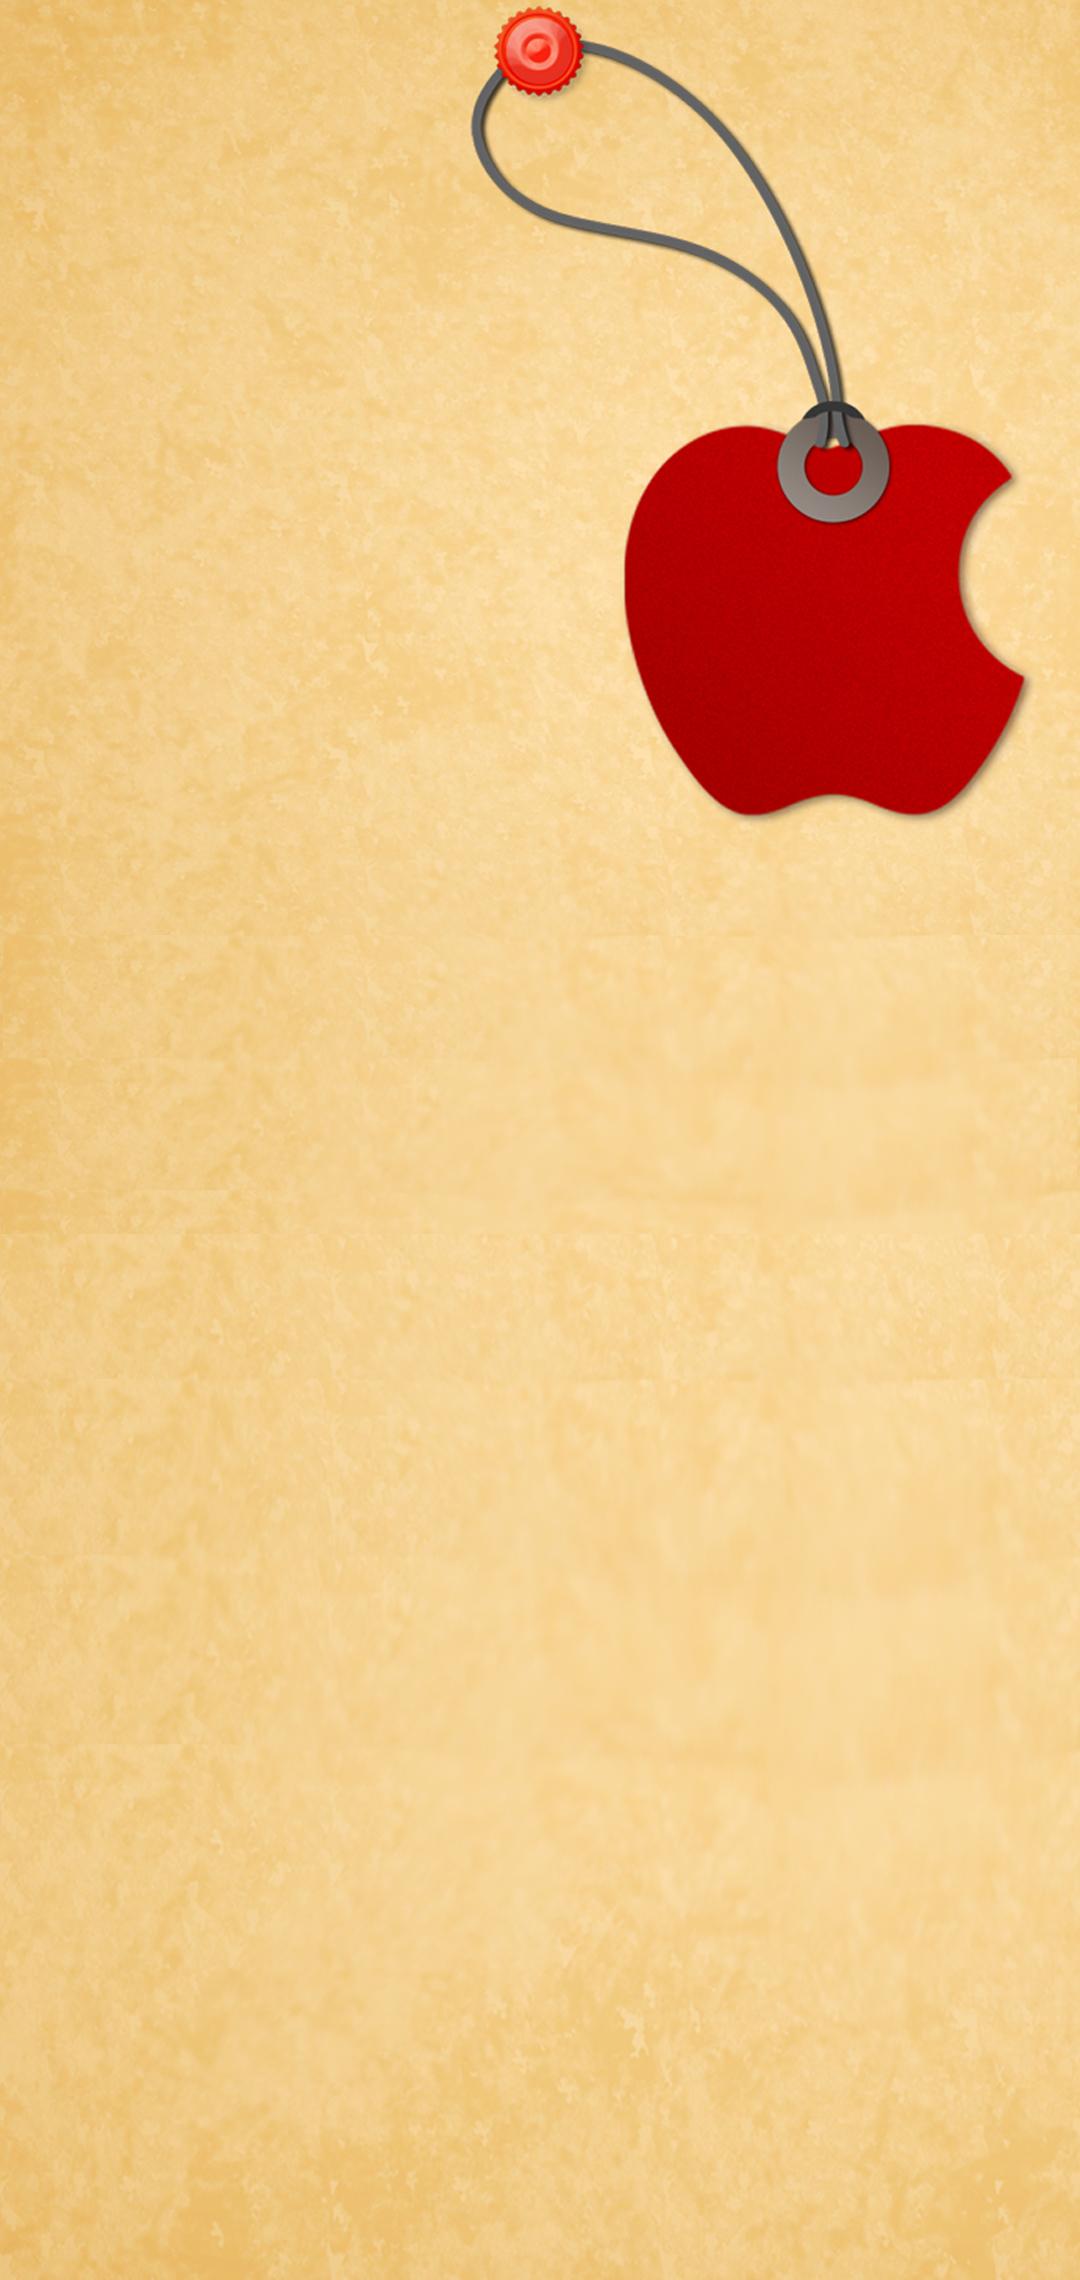 apple logo hole-punch wallpaper